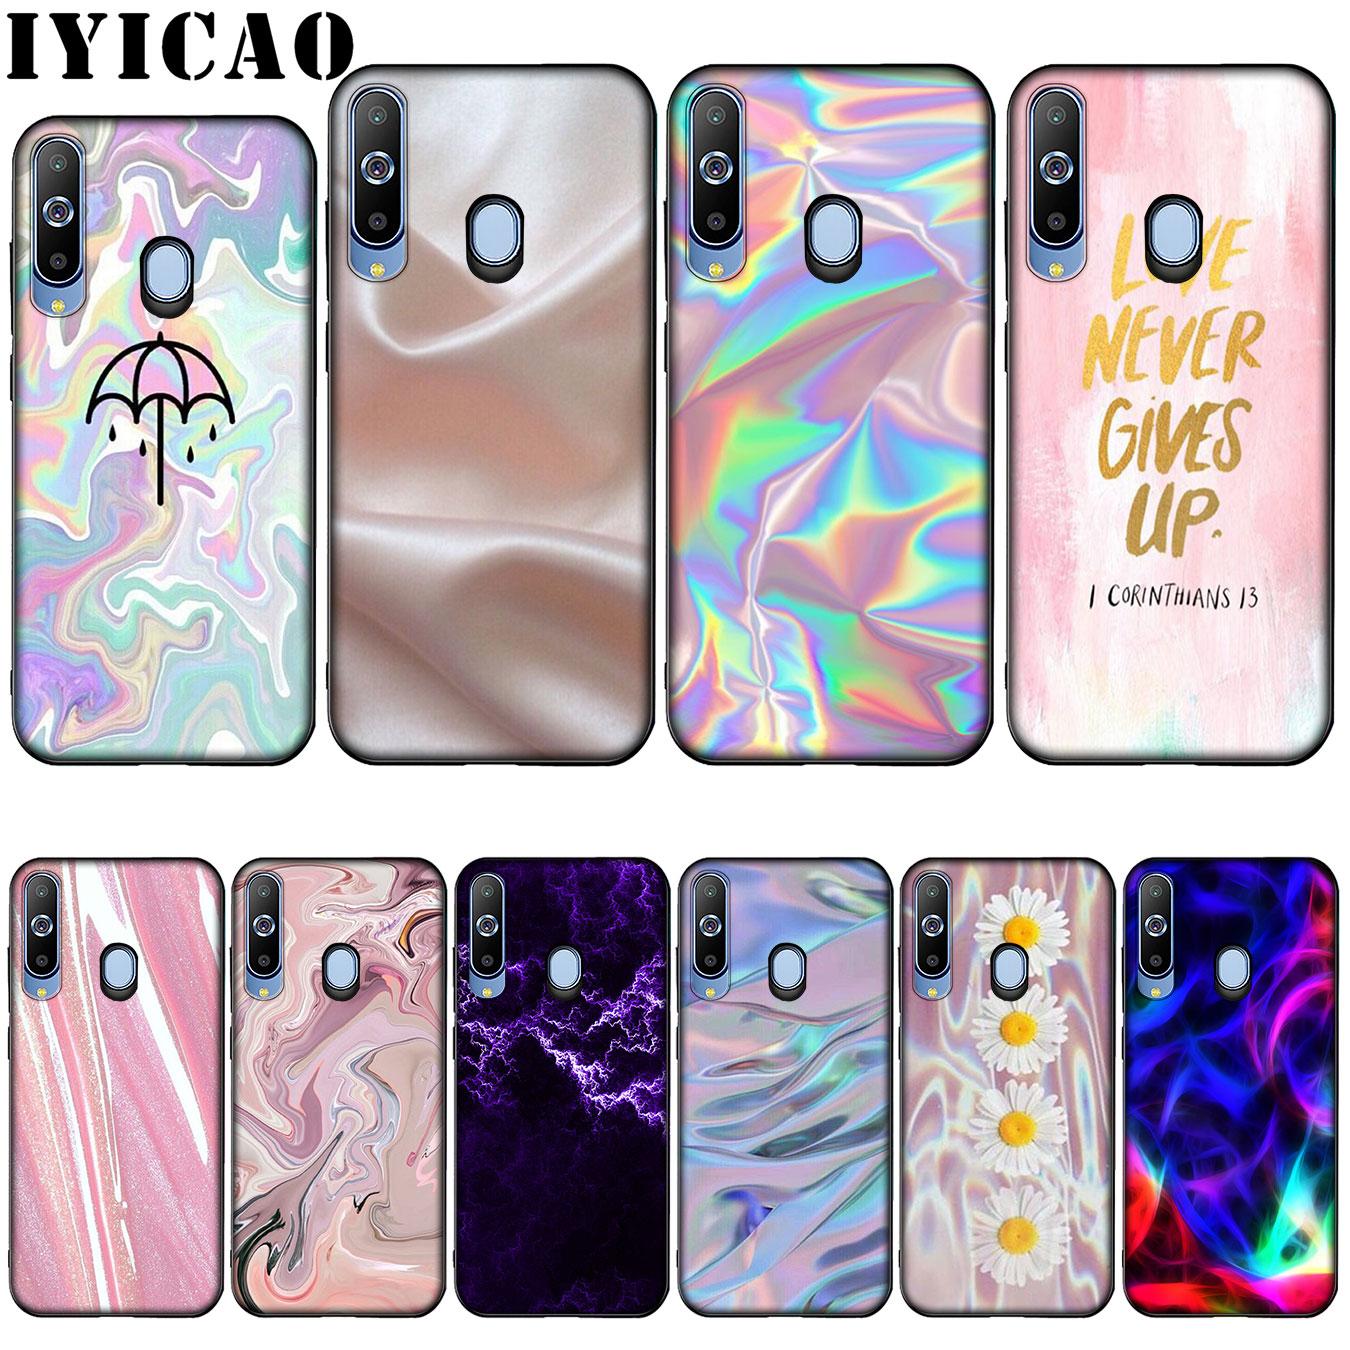 Phone Bags & Cases Fitted Cases Iyicao Pastel Metallic Tumblr Cute Pretty Cell Love Soft Case For Xiaomi Mi 9 8 A2 Lite A1 6 Pocophone F1 Max 3 Mi9 Mi8 Mia2